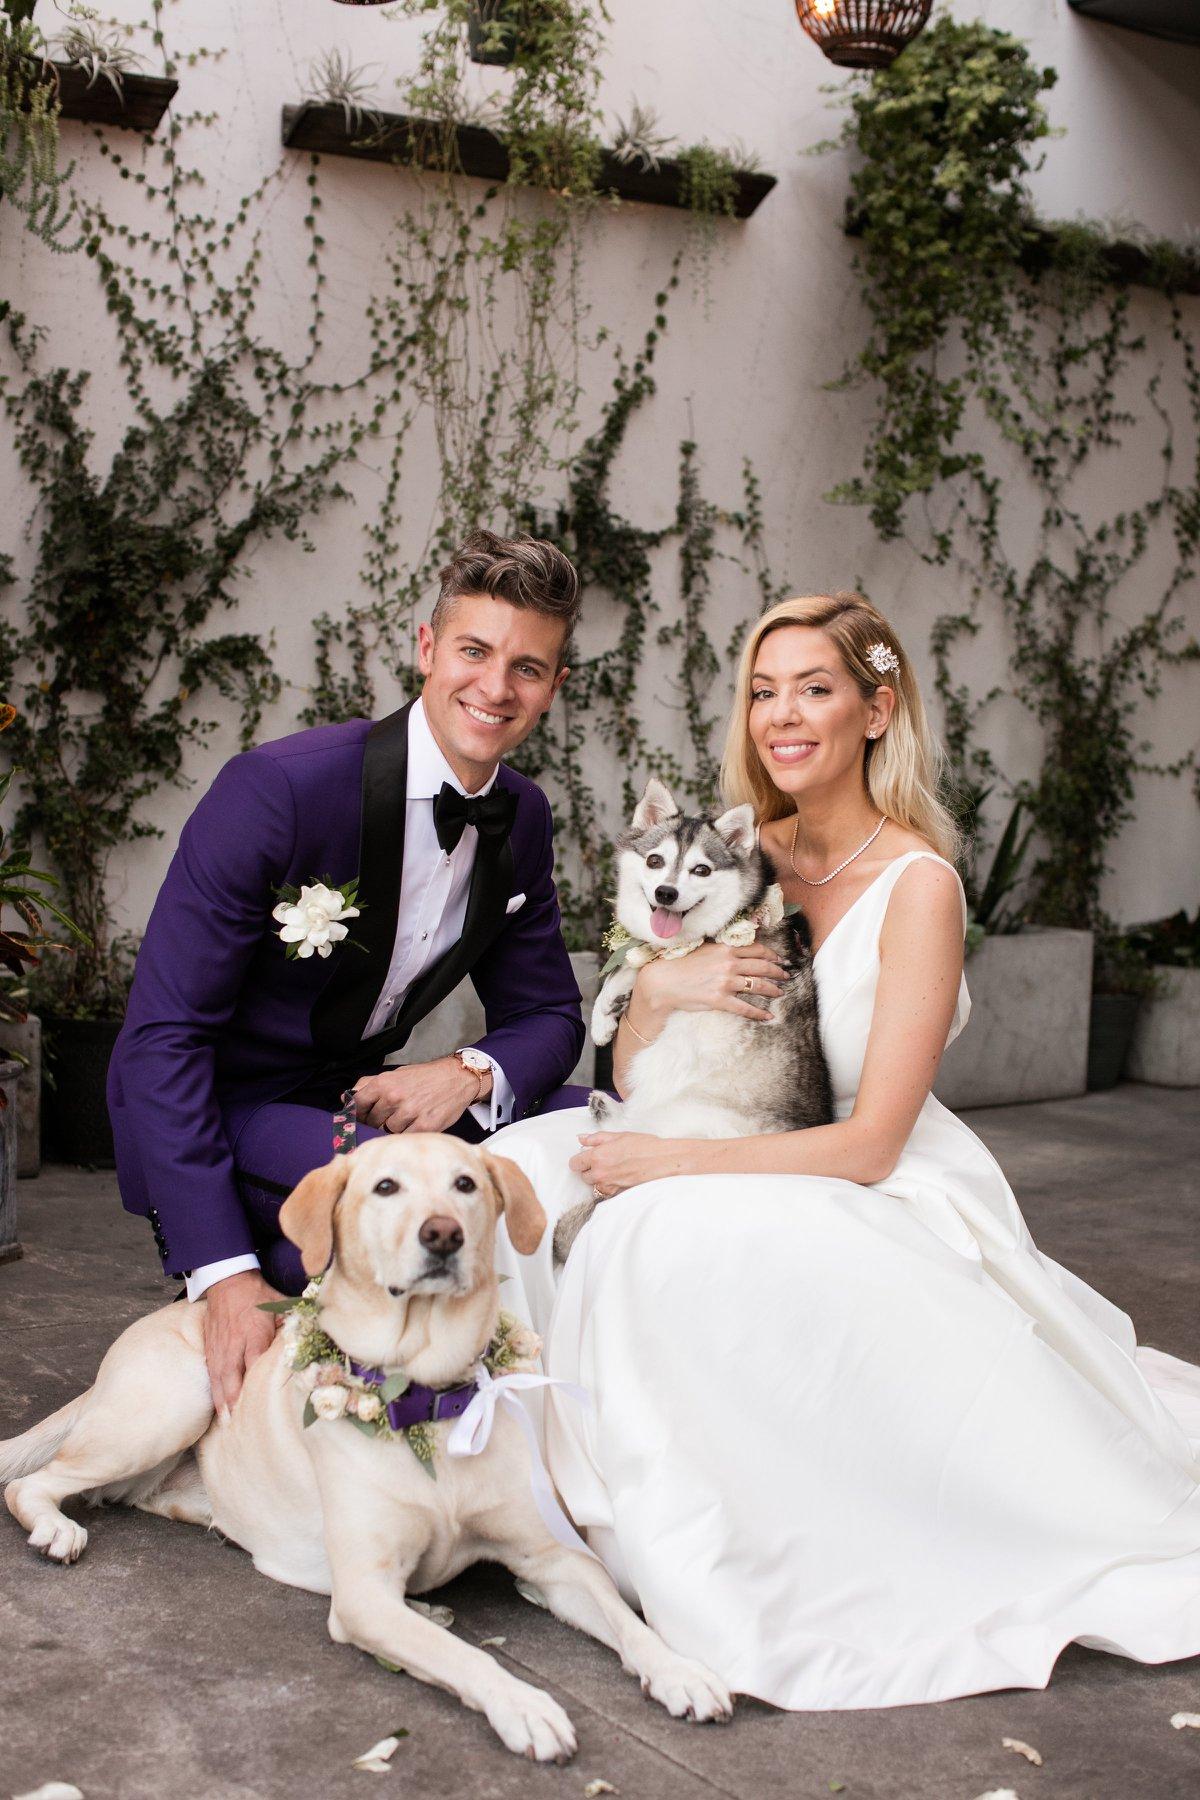 jaclyn smith spraytan bachelor bachelorette wedding